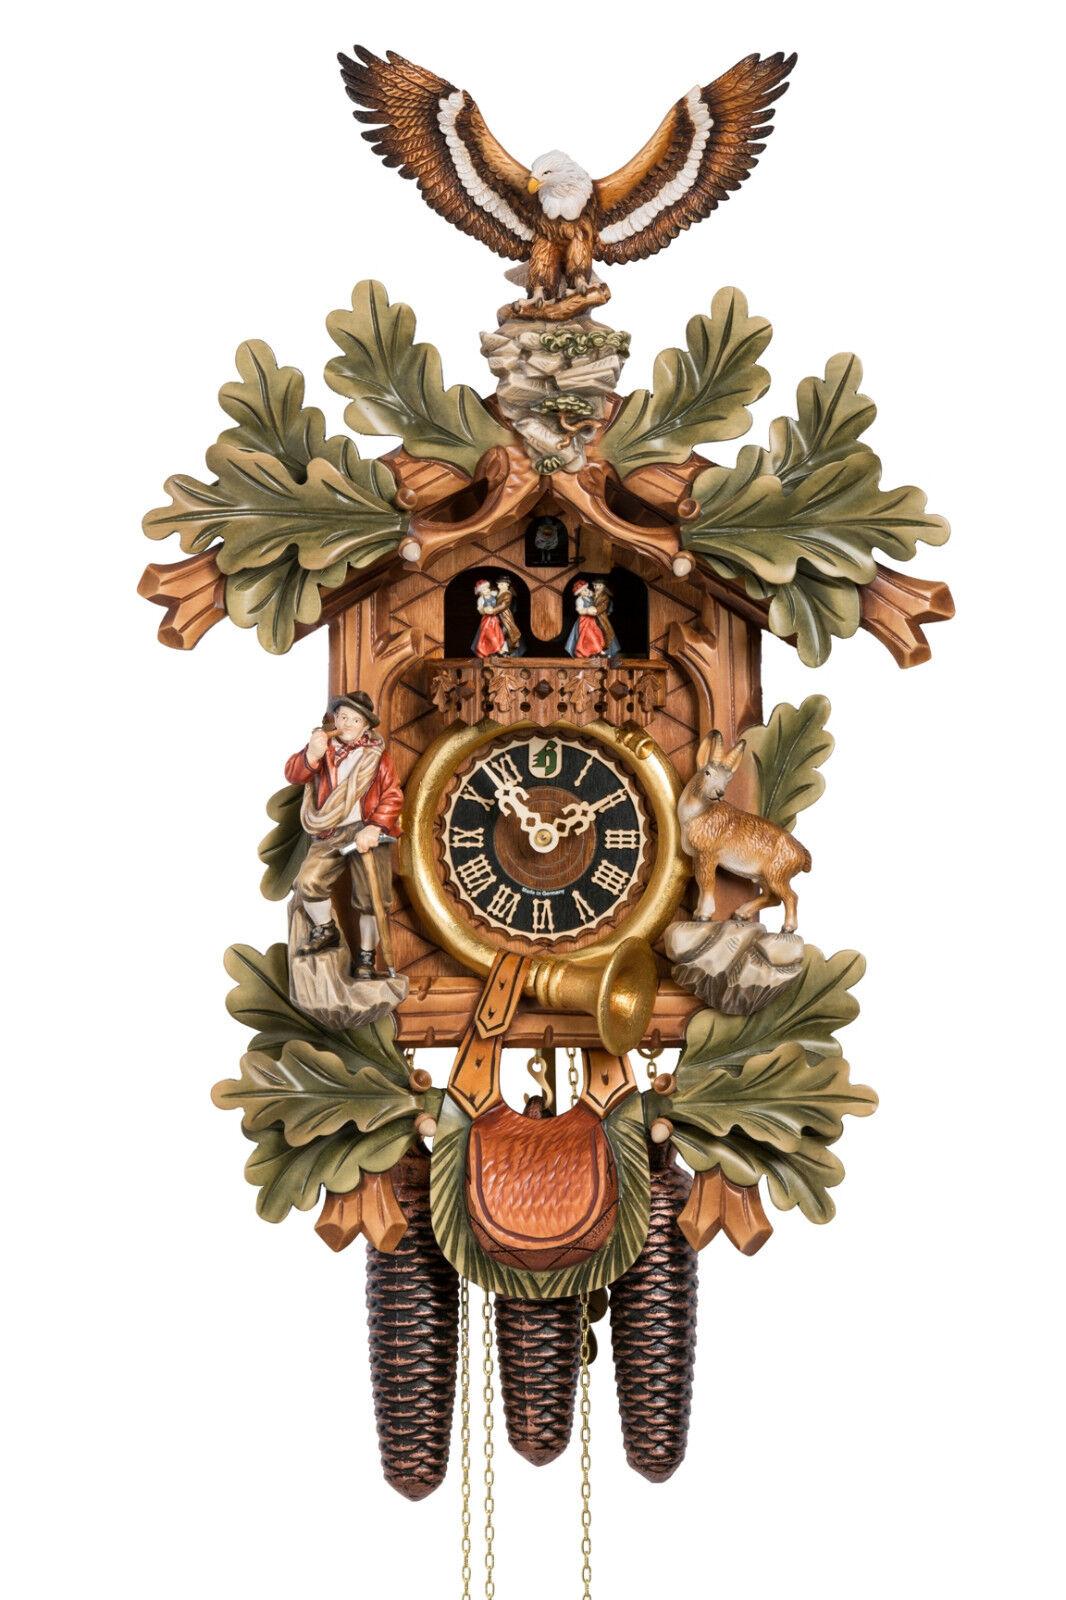 Cuckoo clock black forest 8 day original german hunter wood music new painted ebay - Wooden cuckoo clocks ...